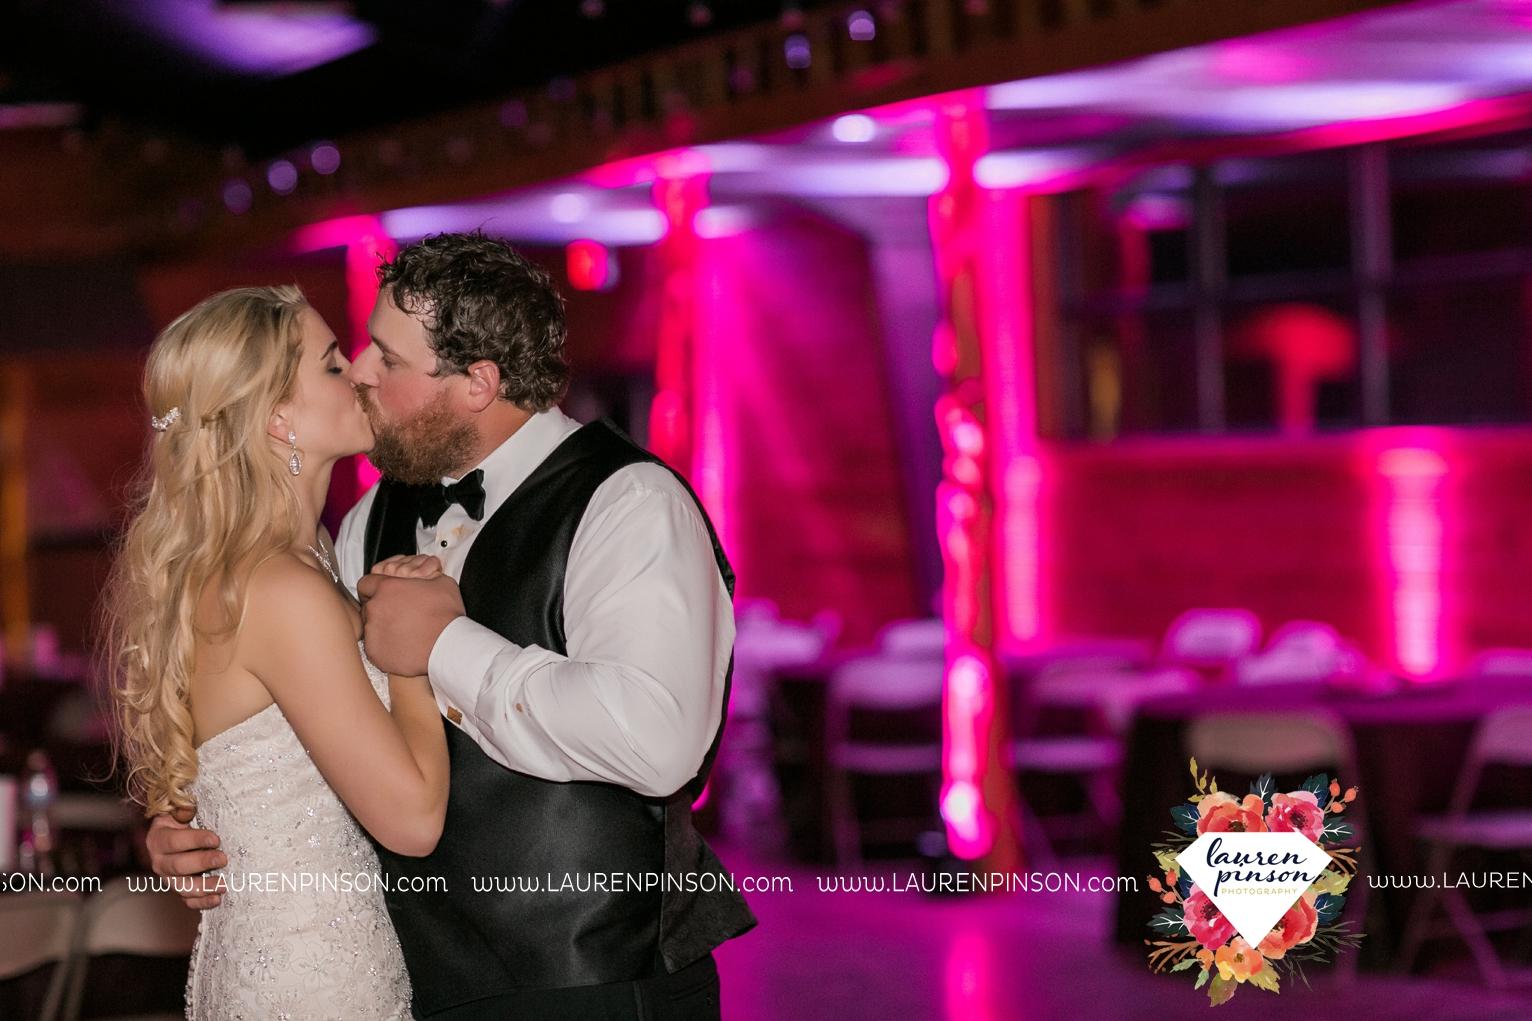 rustic-wichita-falls-texas-wedding-photographer-gold-glam-mayfield-events-market-street-united-allue-bridals-fall_1794.jpg